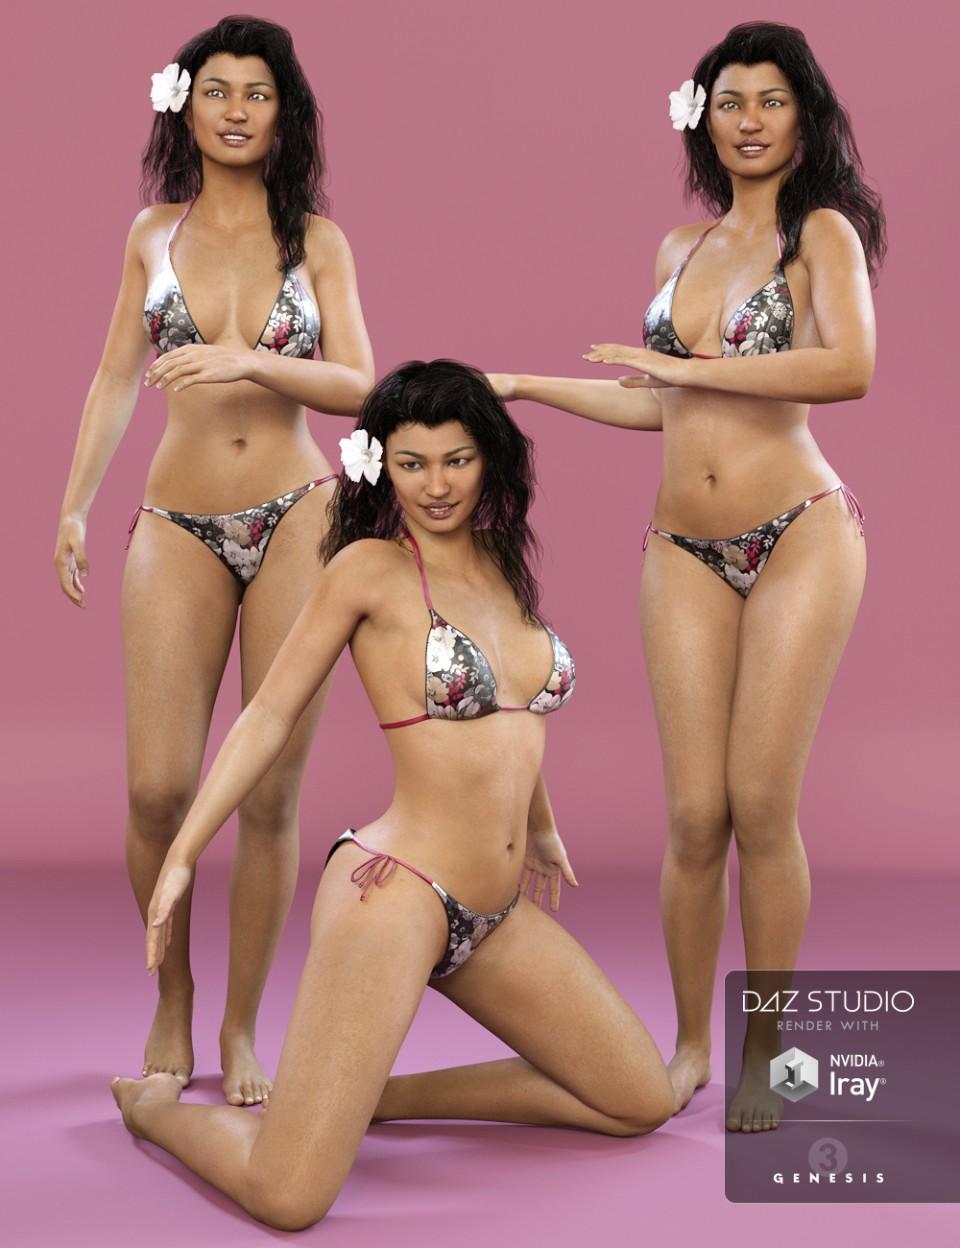 DA Beach Girl Poses for Kalea 7